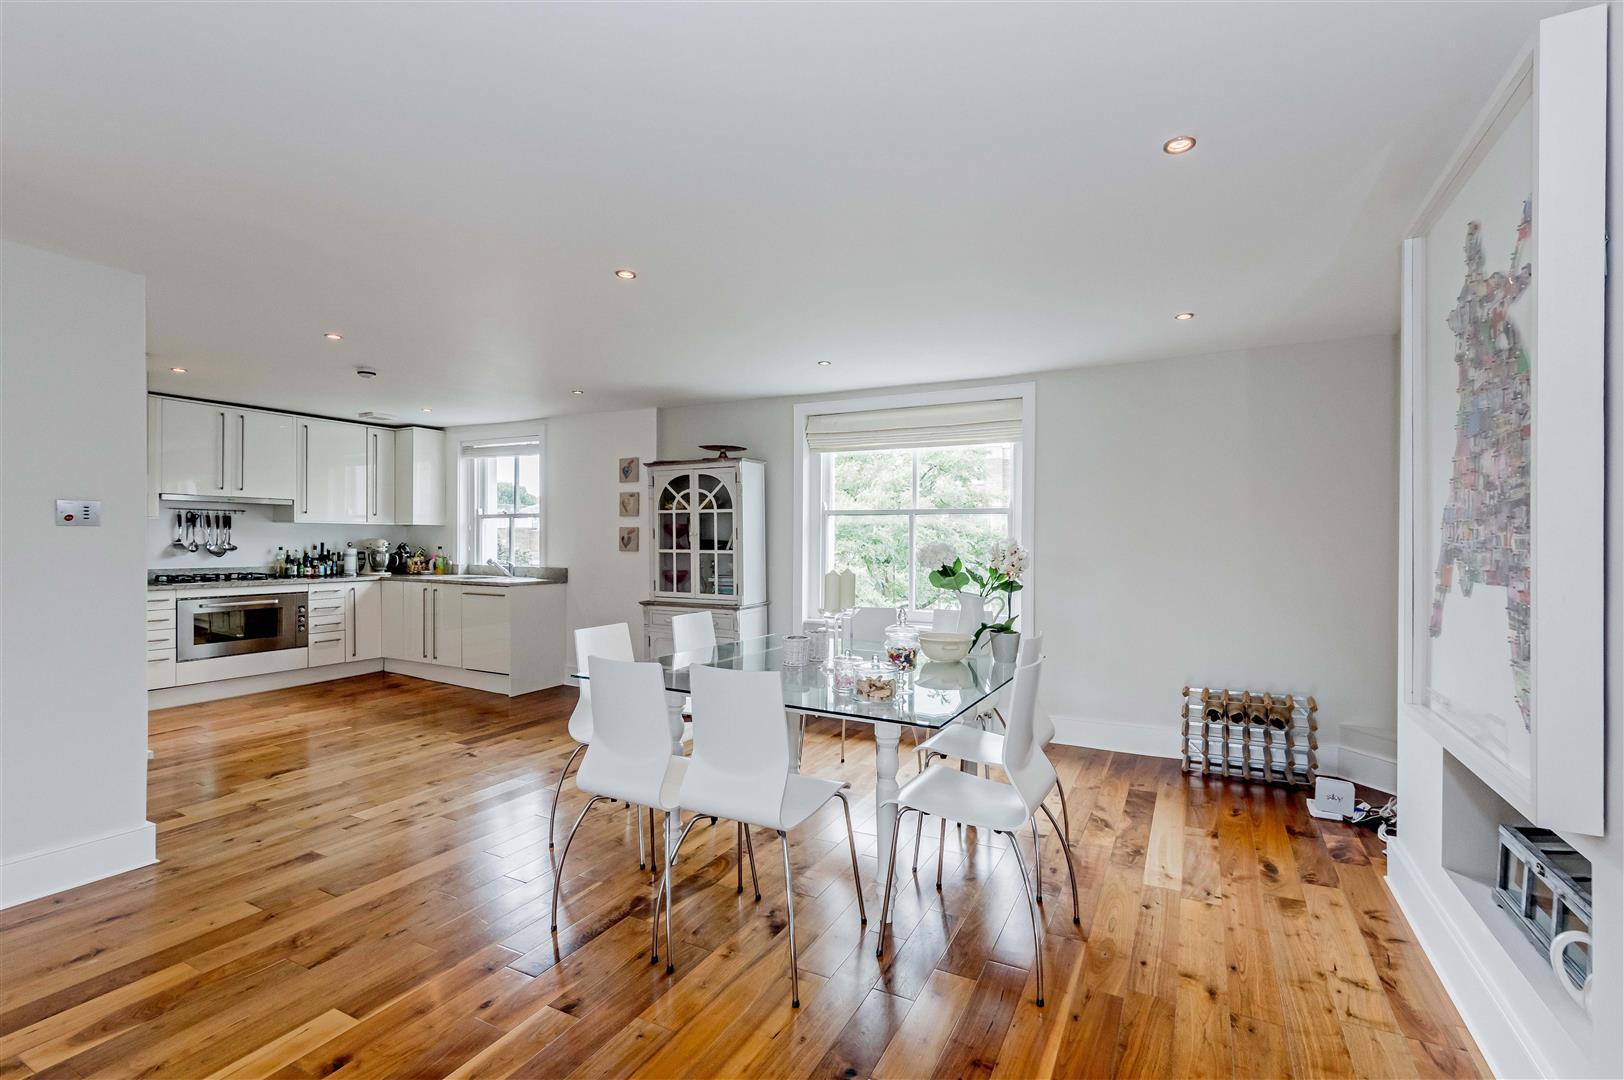 3 Bedrooms Flat for sale in Upper Maisonette, Haverstock Hill, Belsize Park, NW3